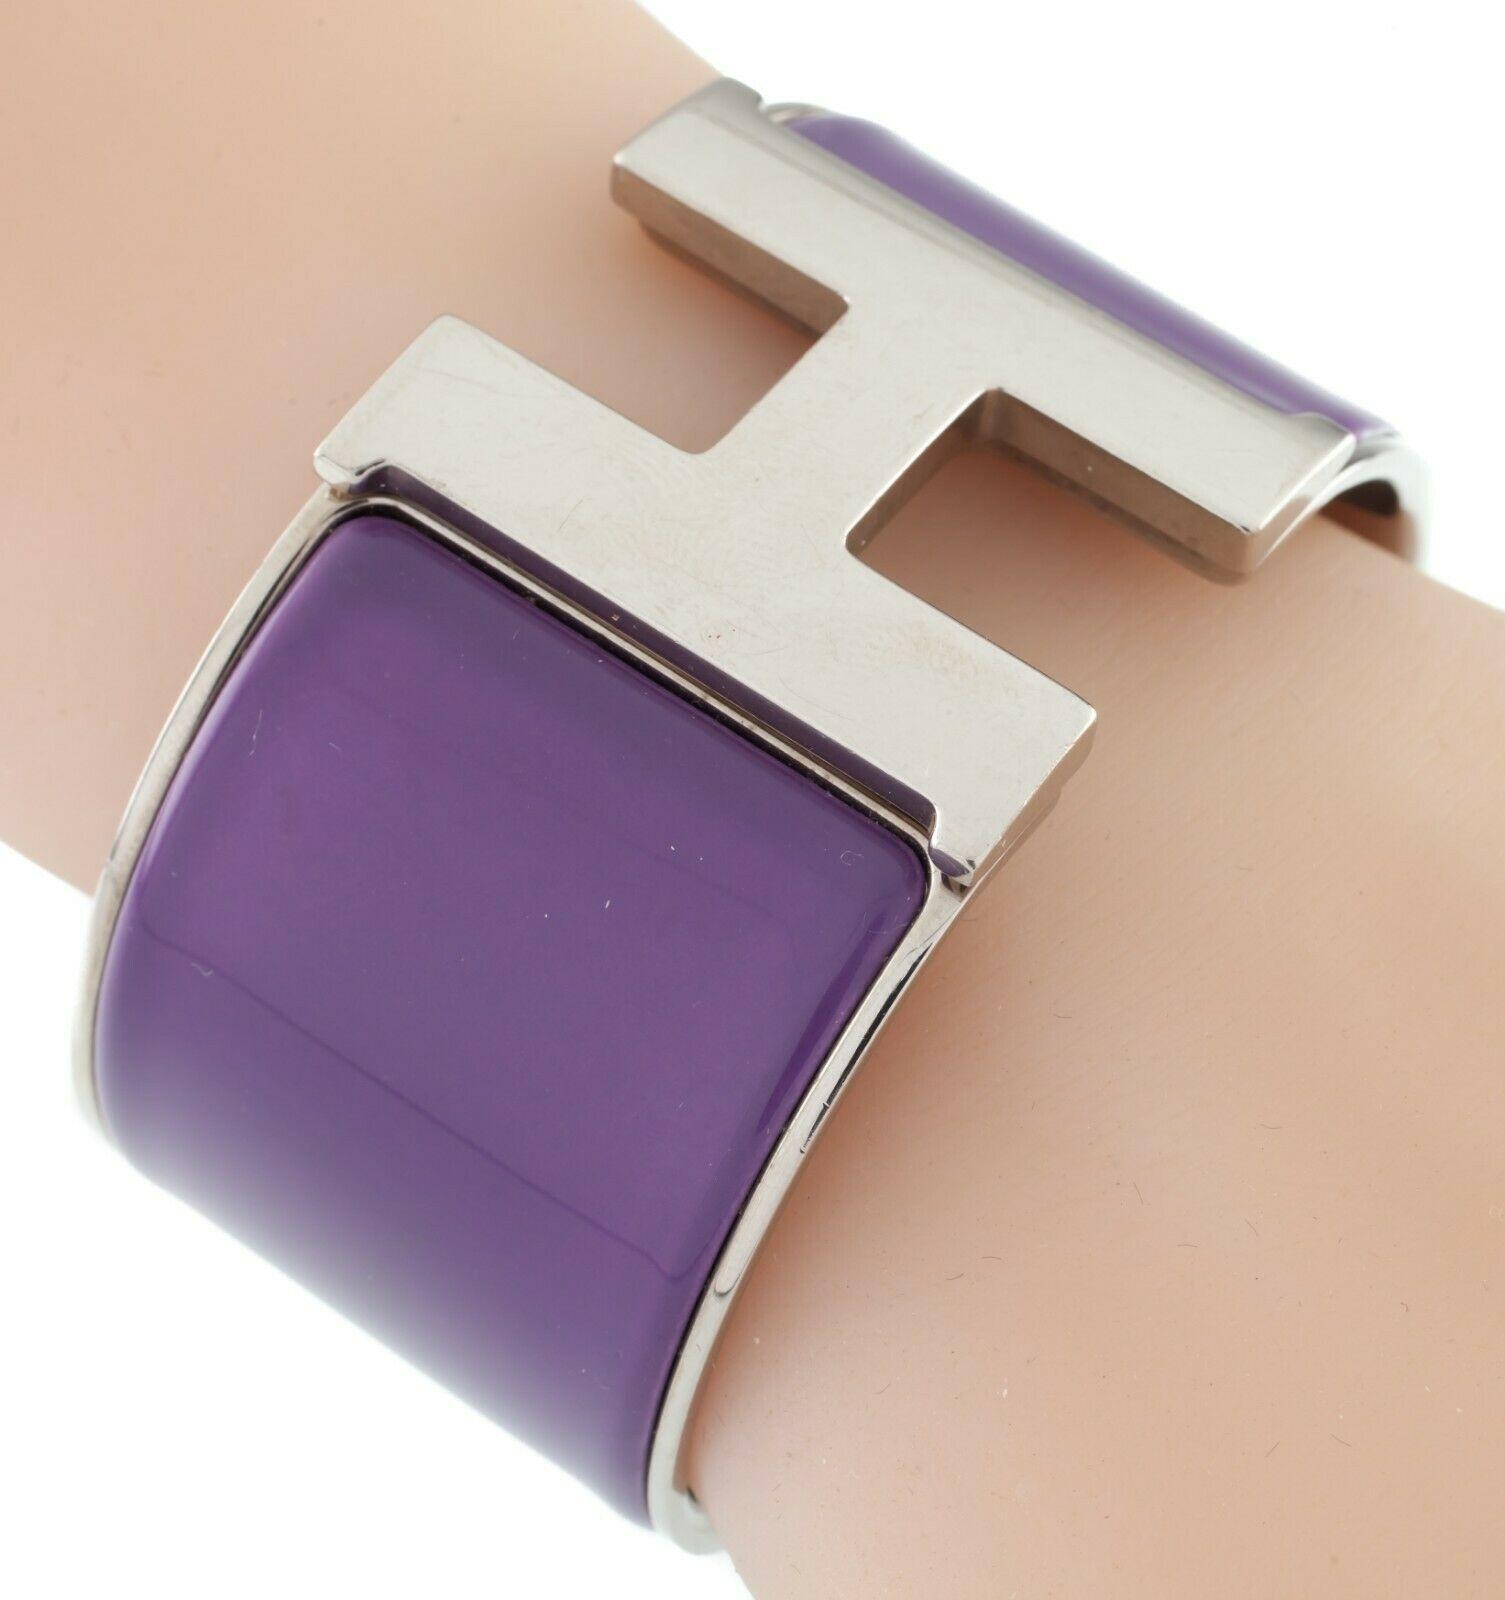 Hermès Clic Clac Violeta Extra Ancho Pulsera Nice! image 2